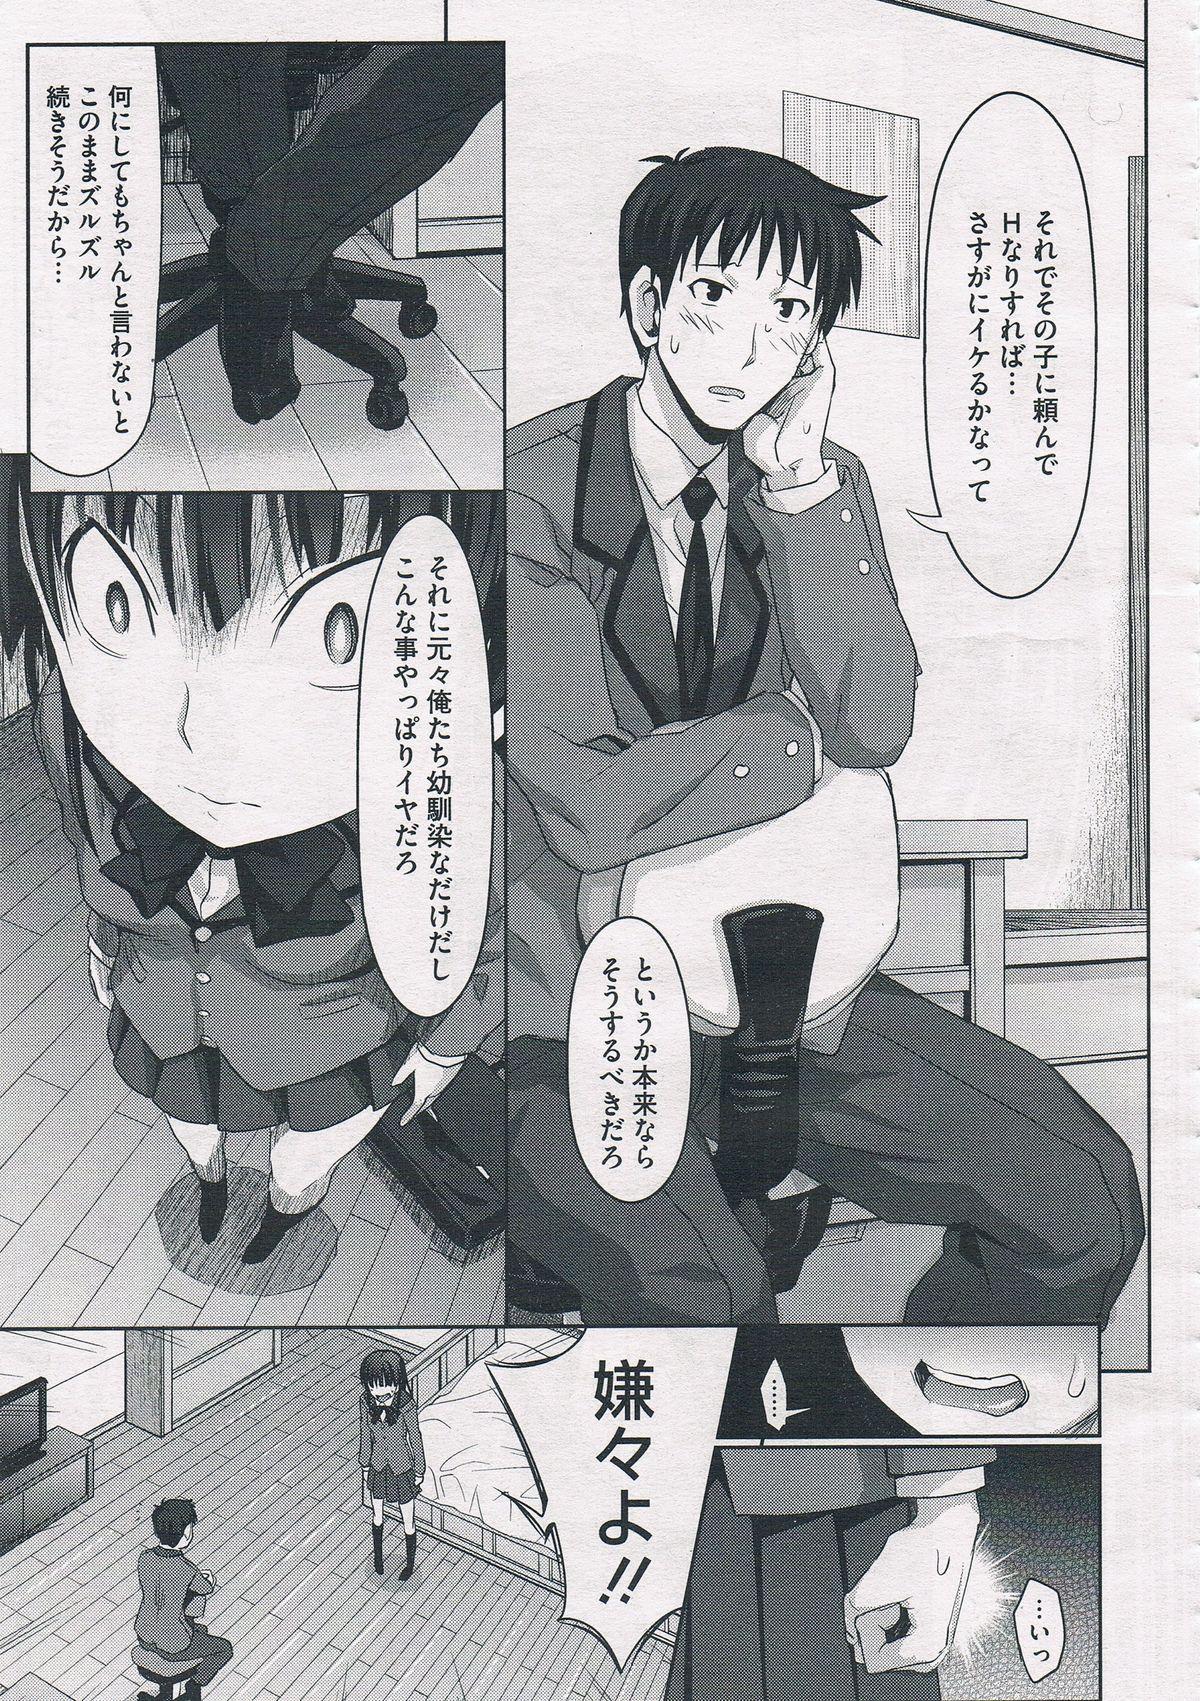 Migite no koibito COMIC Megastore 2012-07 8